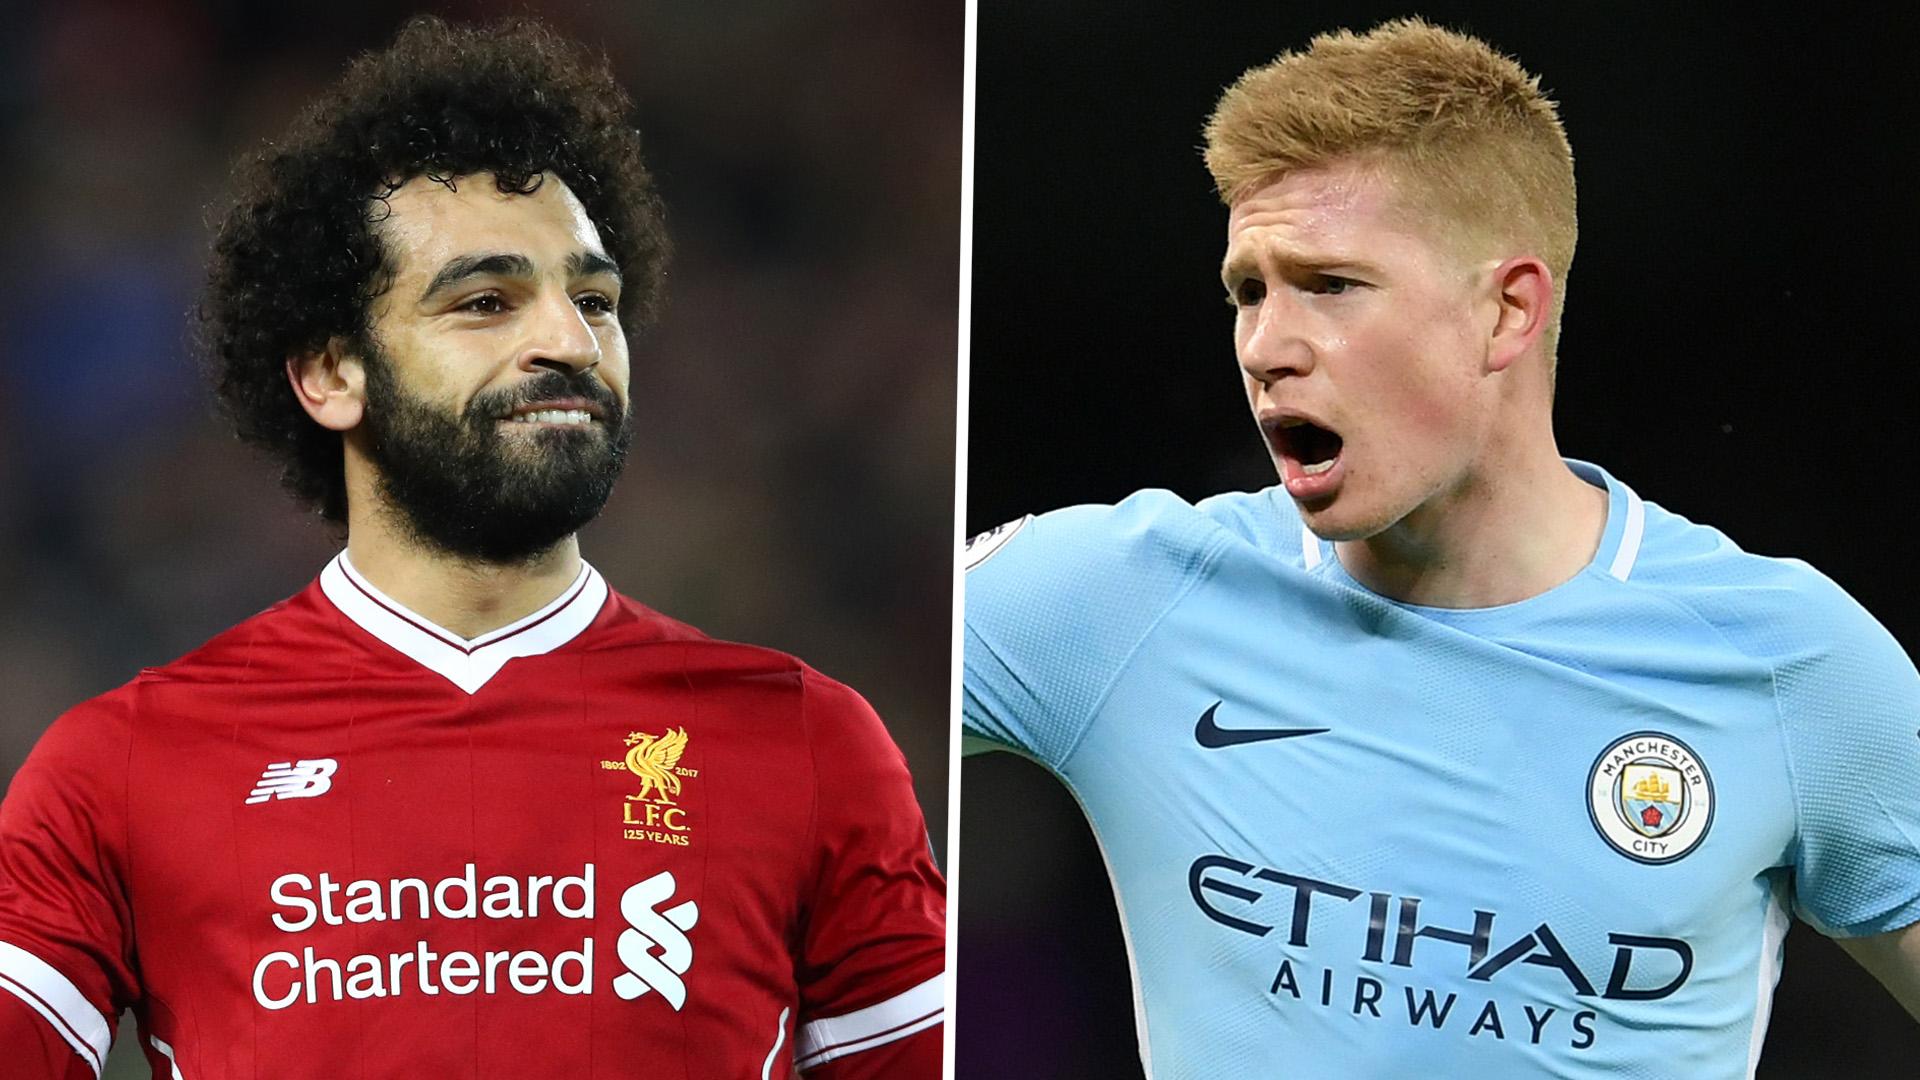 Guardiola unhappy at De Bruyne snub but Salah win cannot be disputed